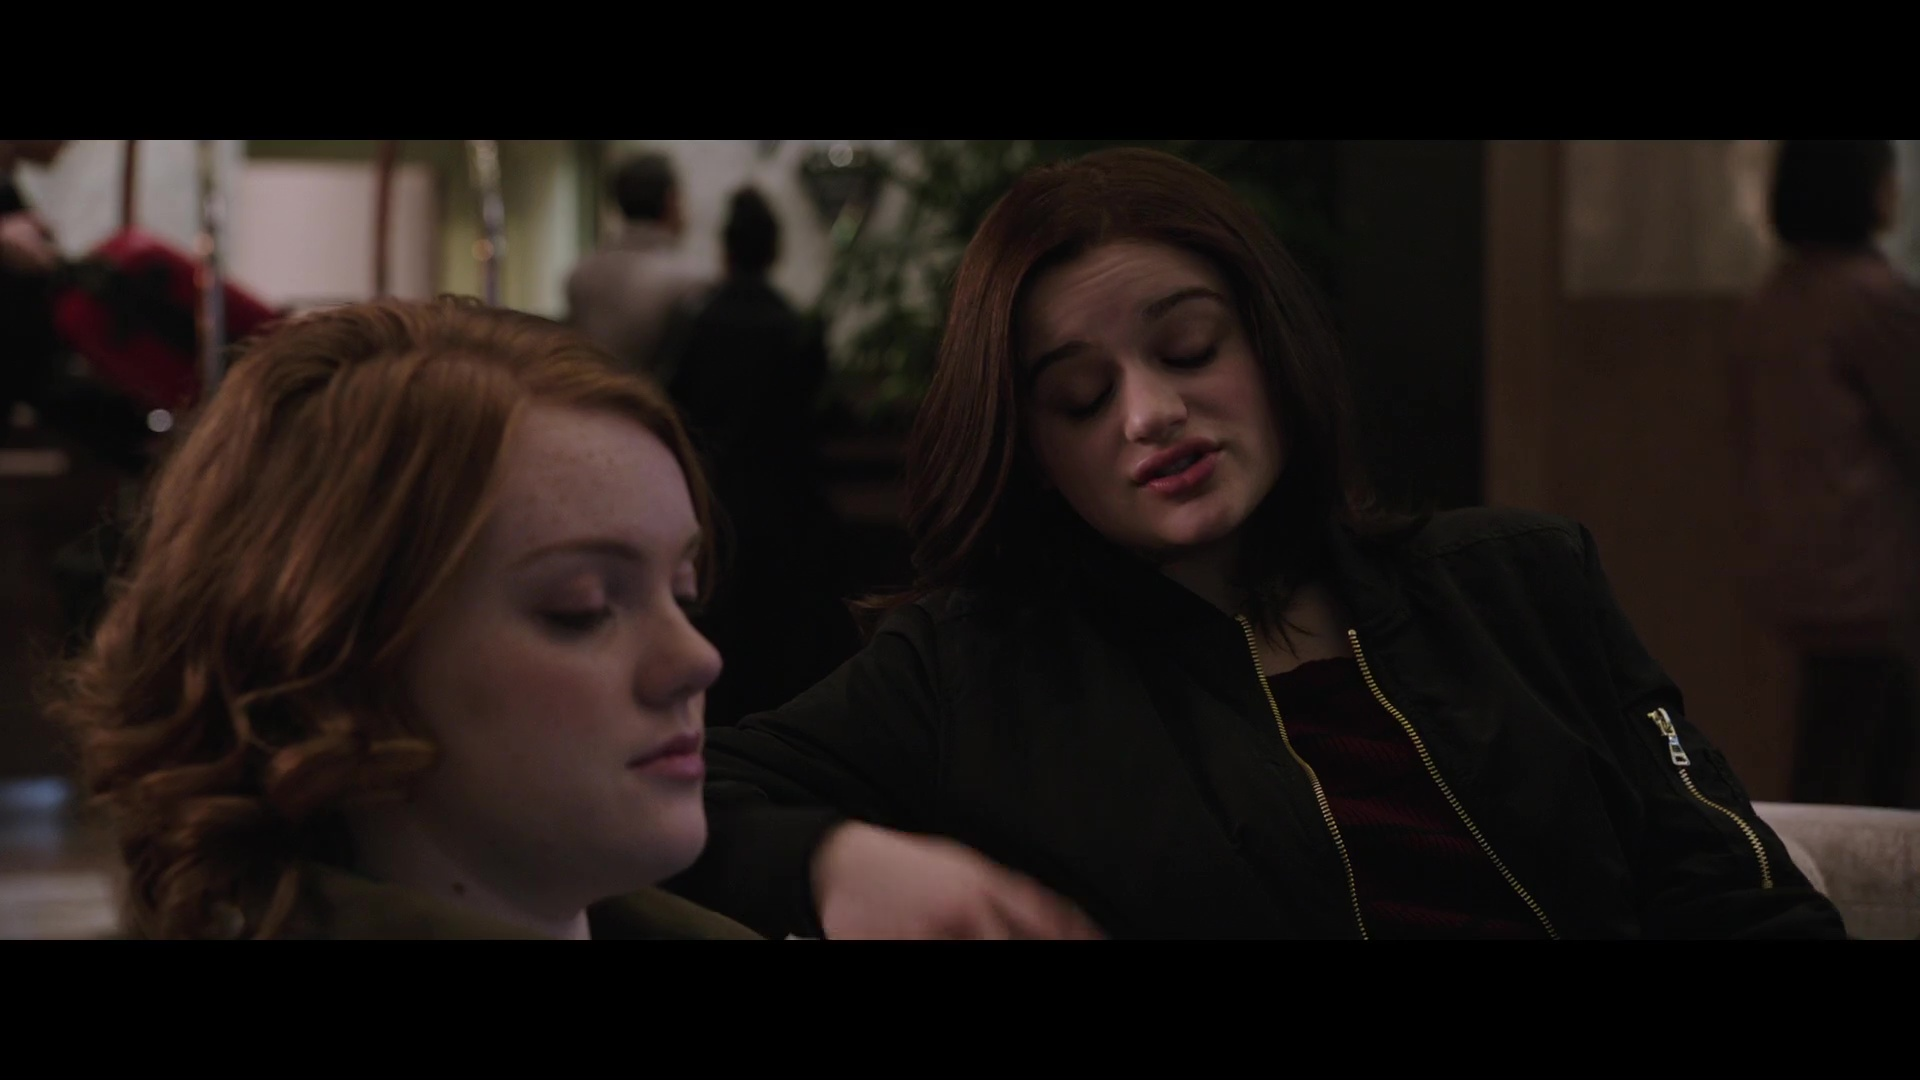 7 Deseos 1080p Lat-Cast-Ing 5.1 (2017)